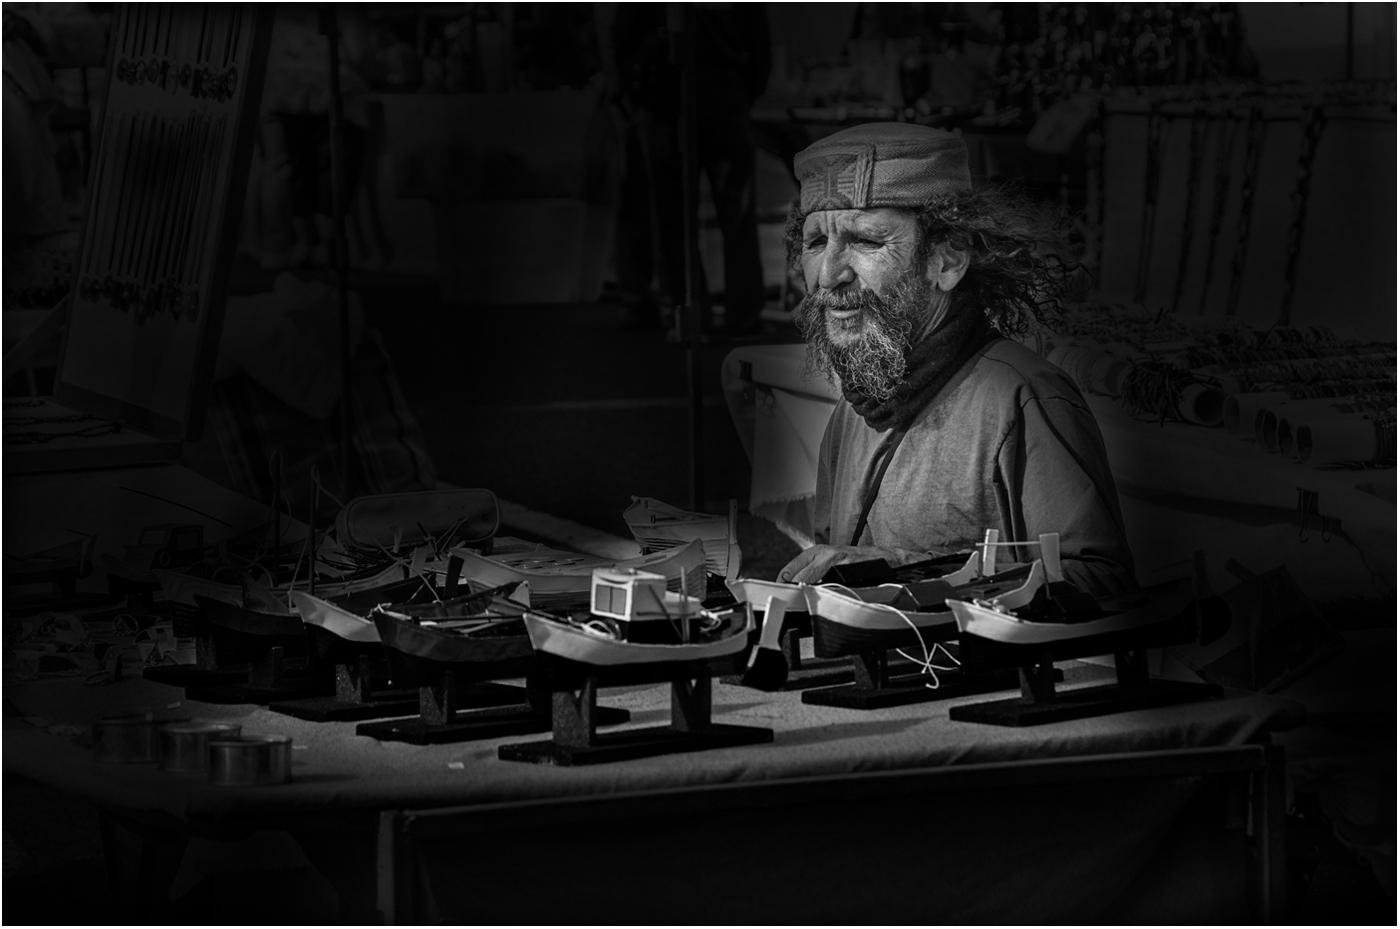 The Boat Maker